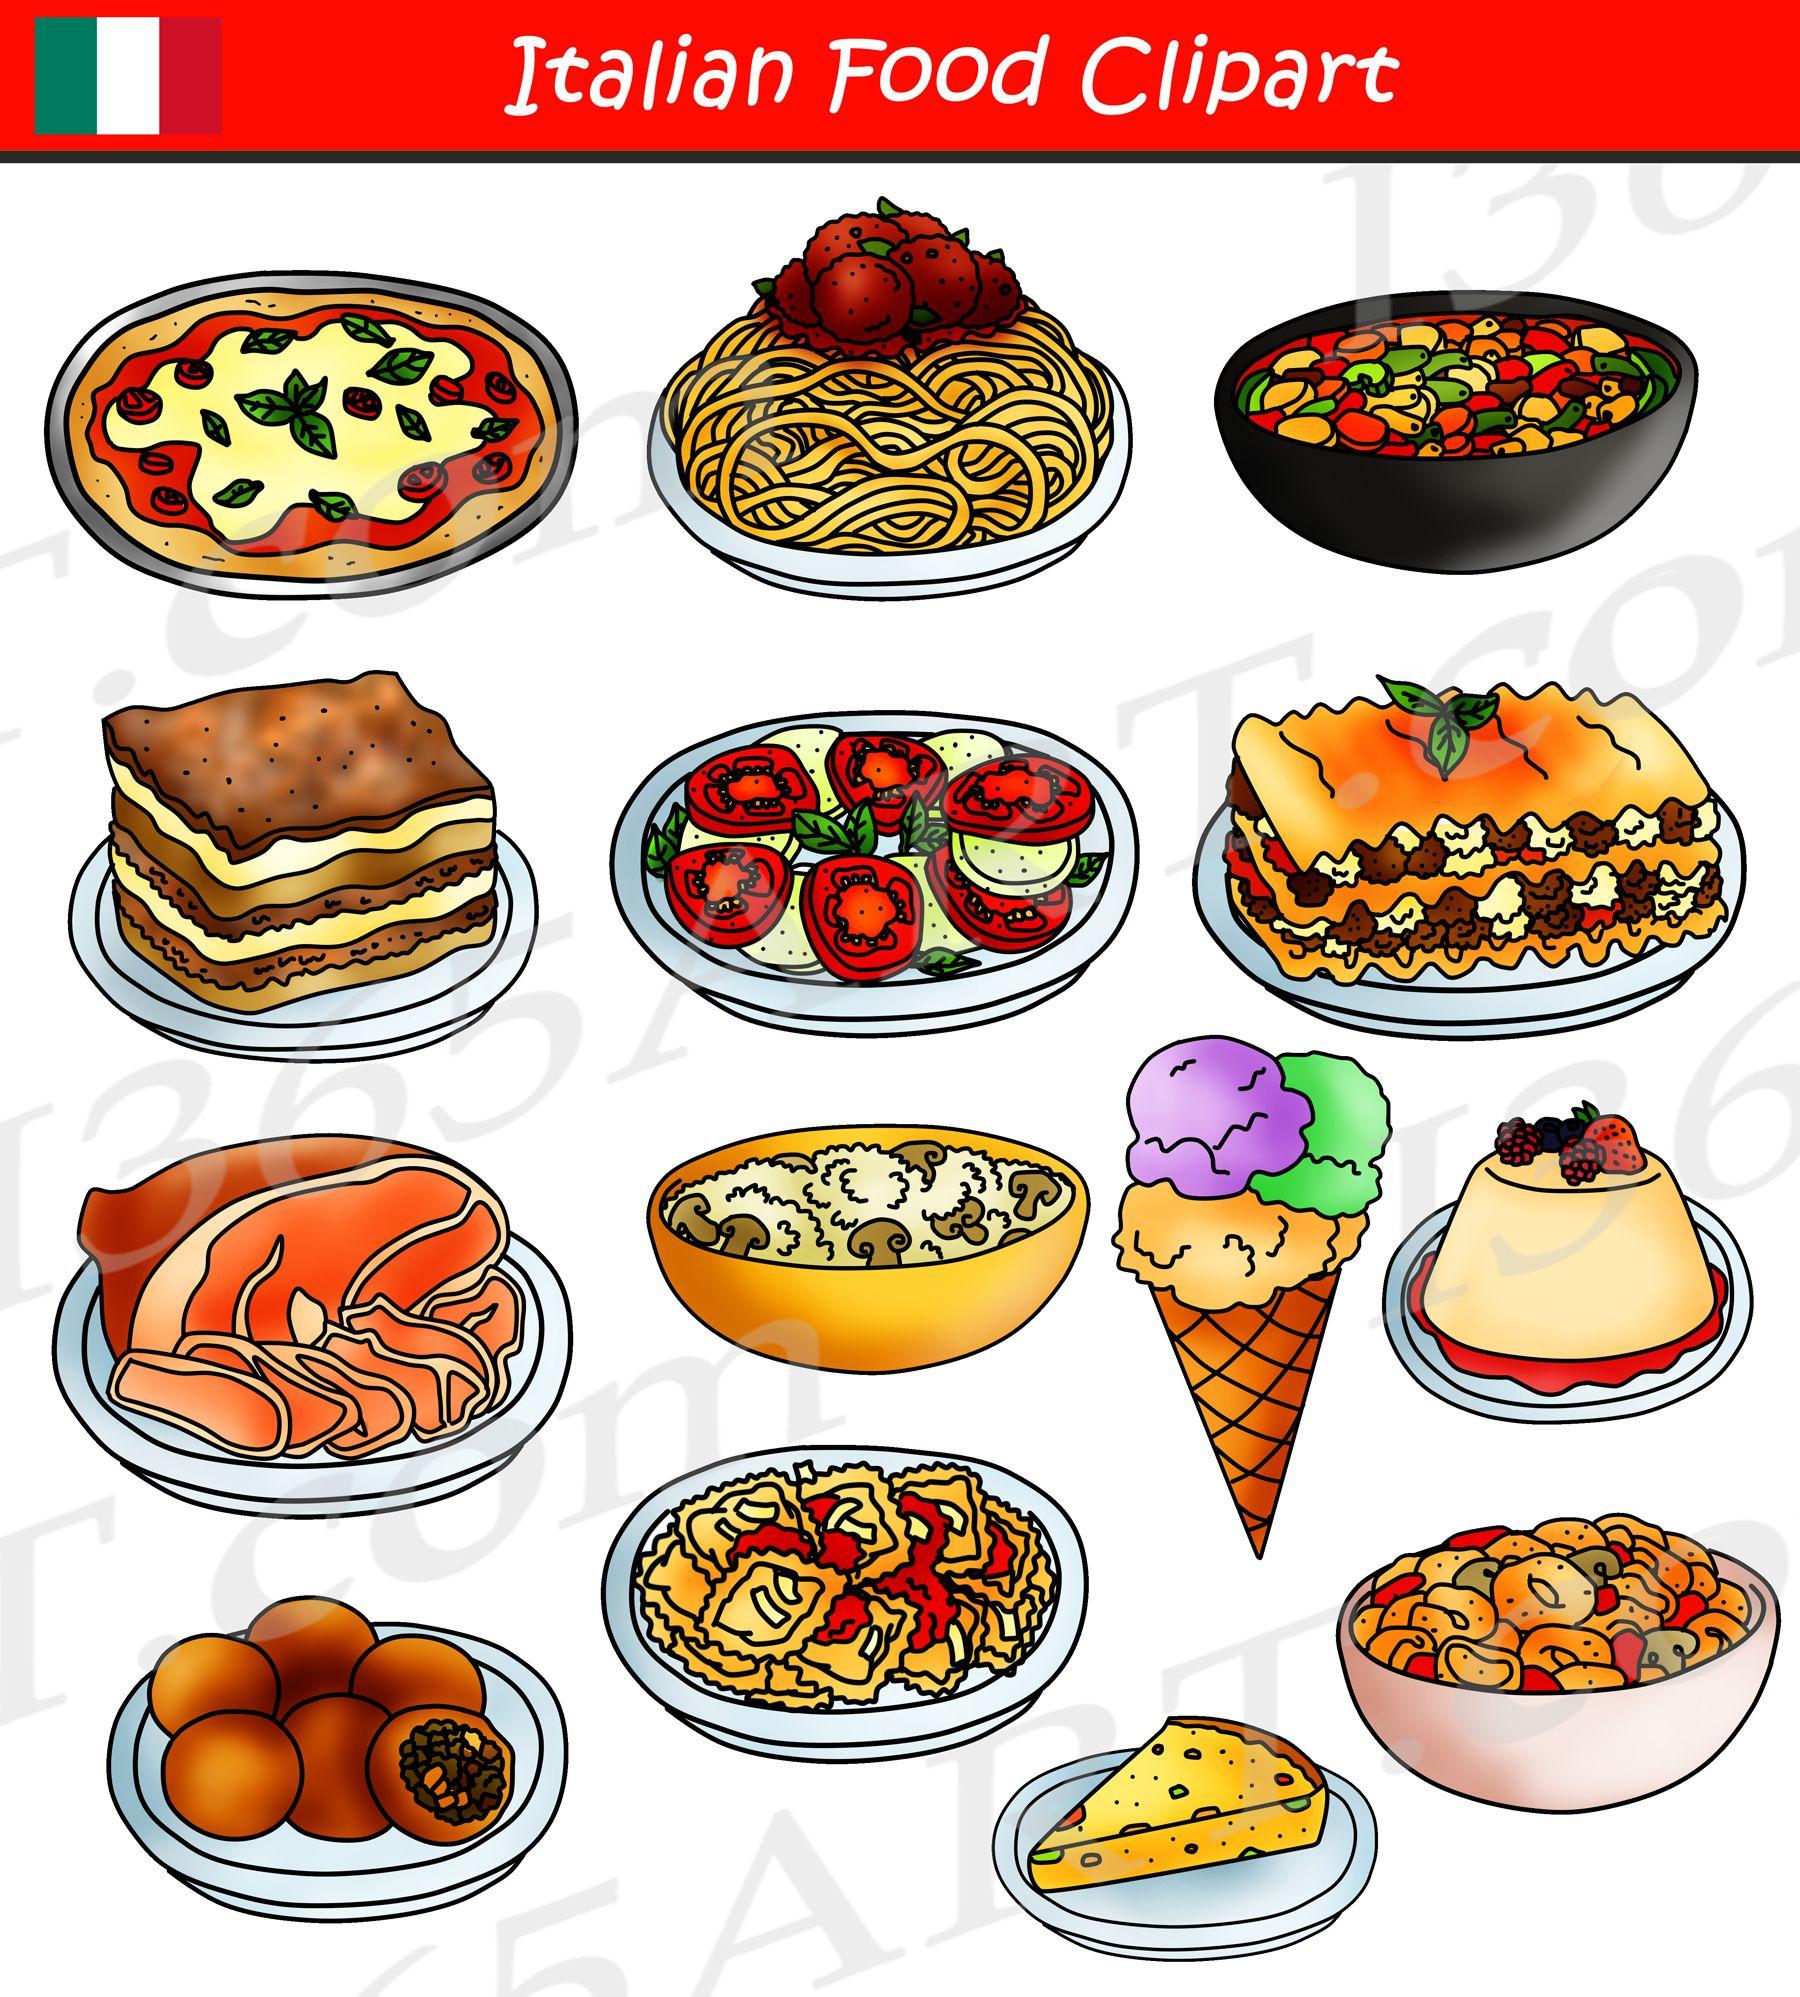 Italian Food Clipart International Food Graphics Food